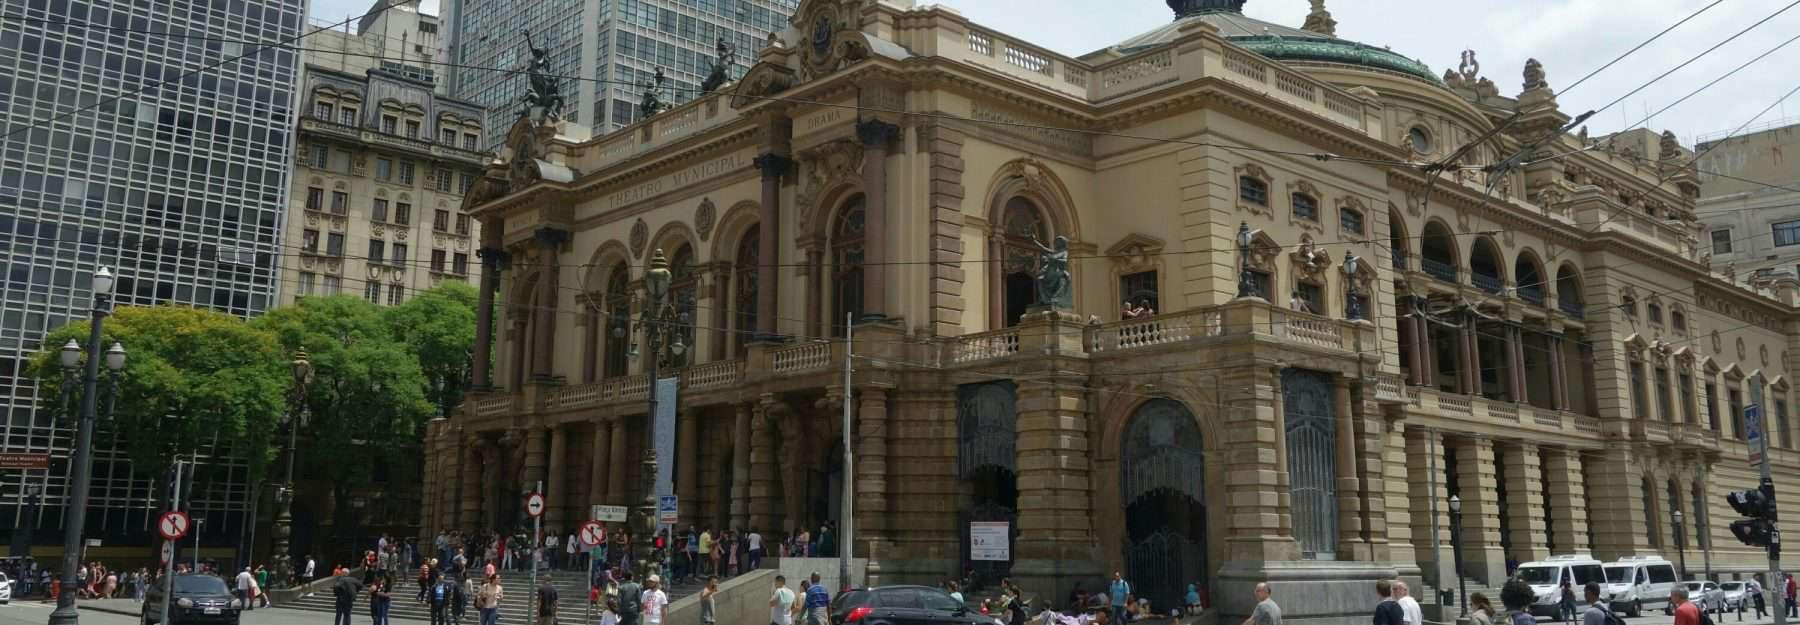 Teatro Municipal, Sao Paulo, Brazil